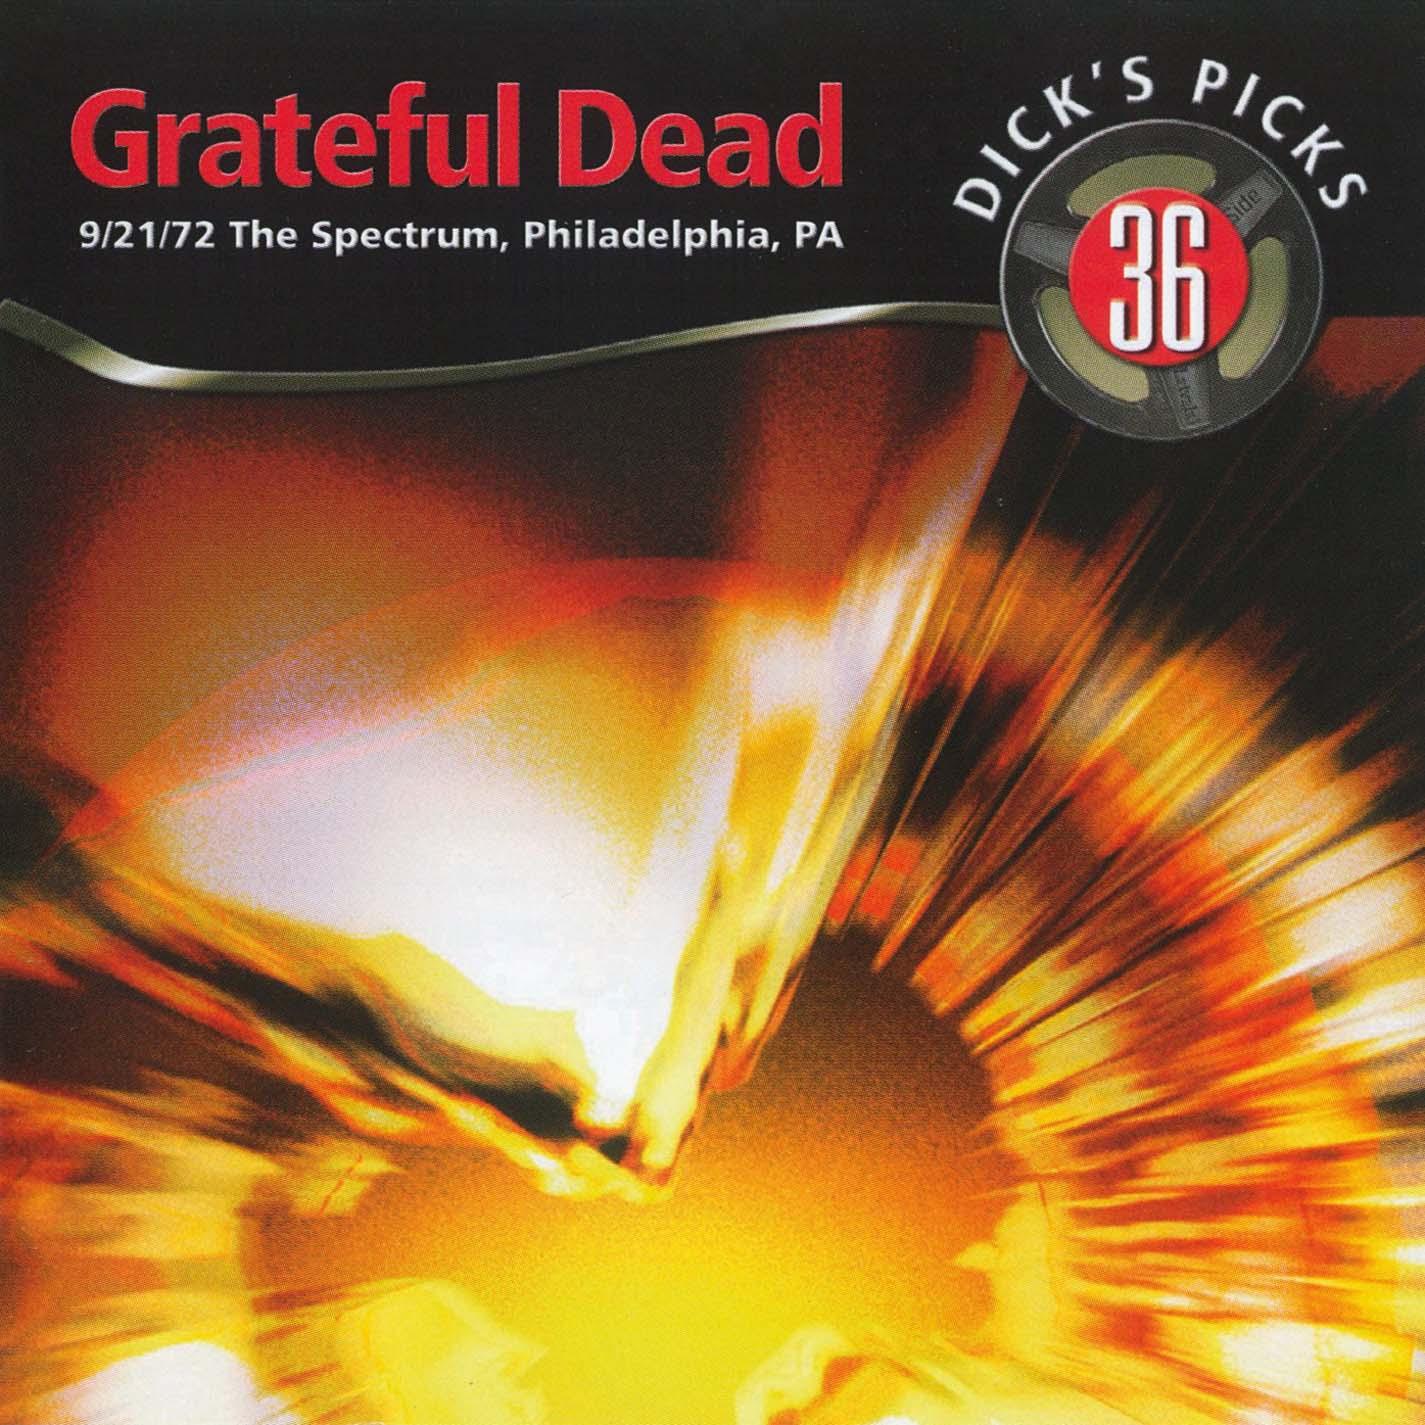 Grateful Dead Dick's Picks 36 album cover artwork